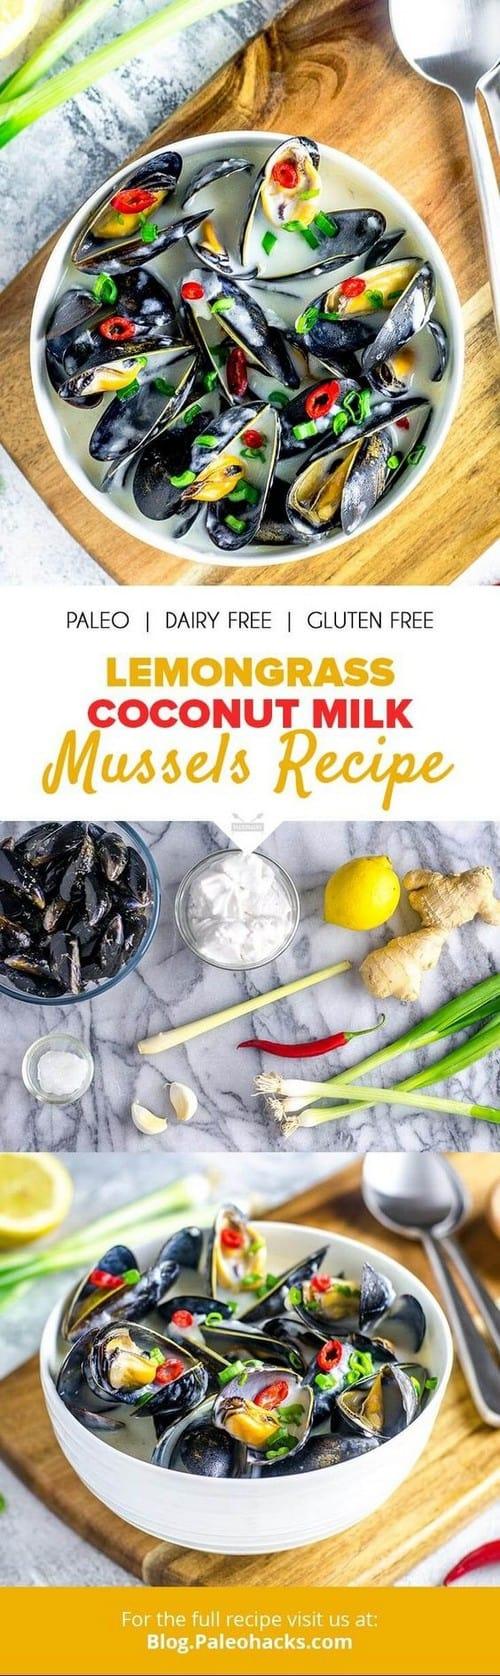 lemongrass-coconut-milk-mussels